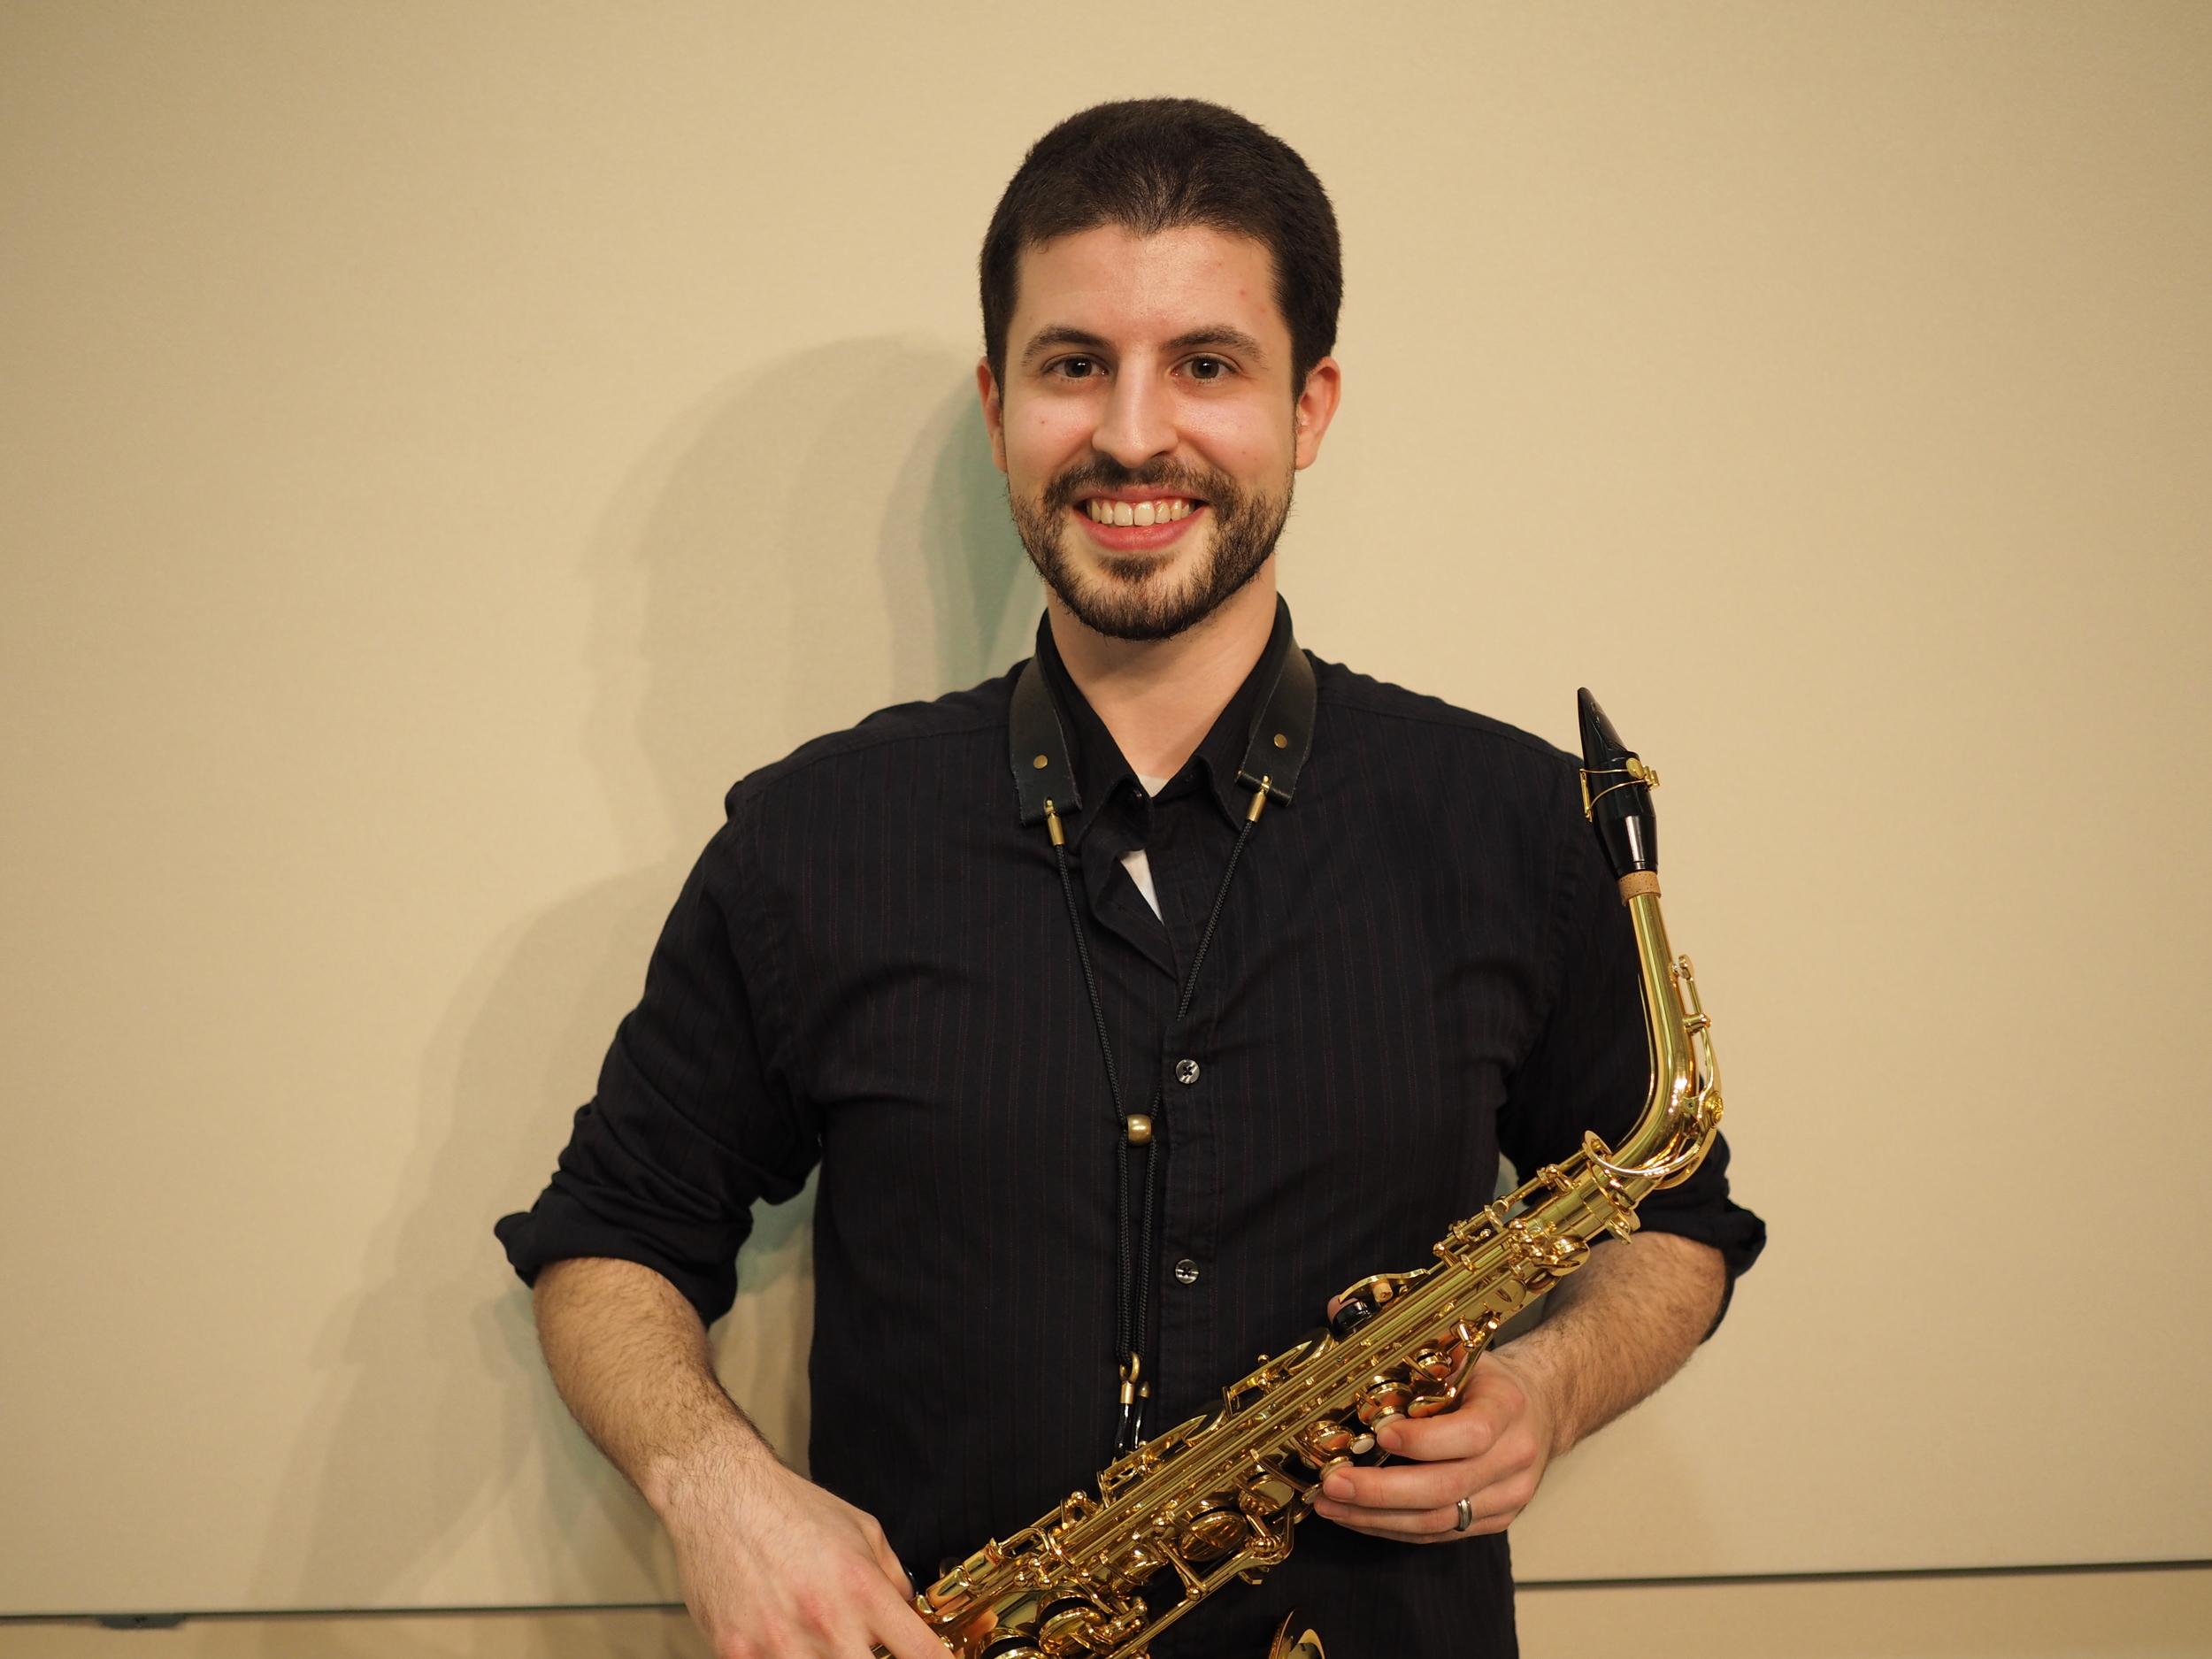 Nick Svoboda - M.M. (TA) - Monroeville, PA